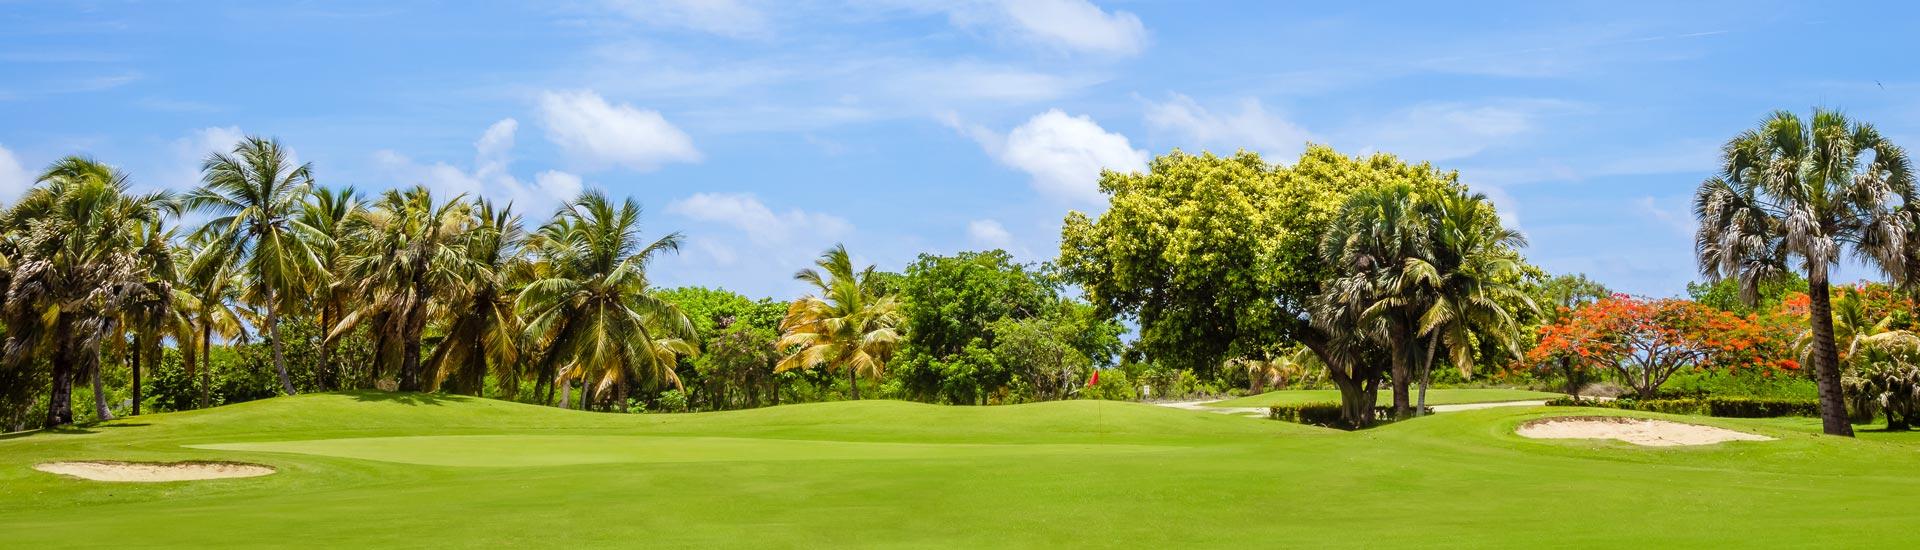 Cocotal Golf - Website por Grupo Interactivo